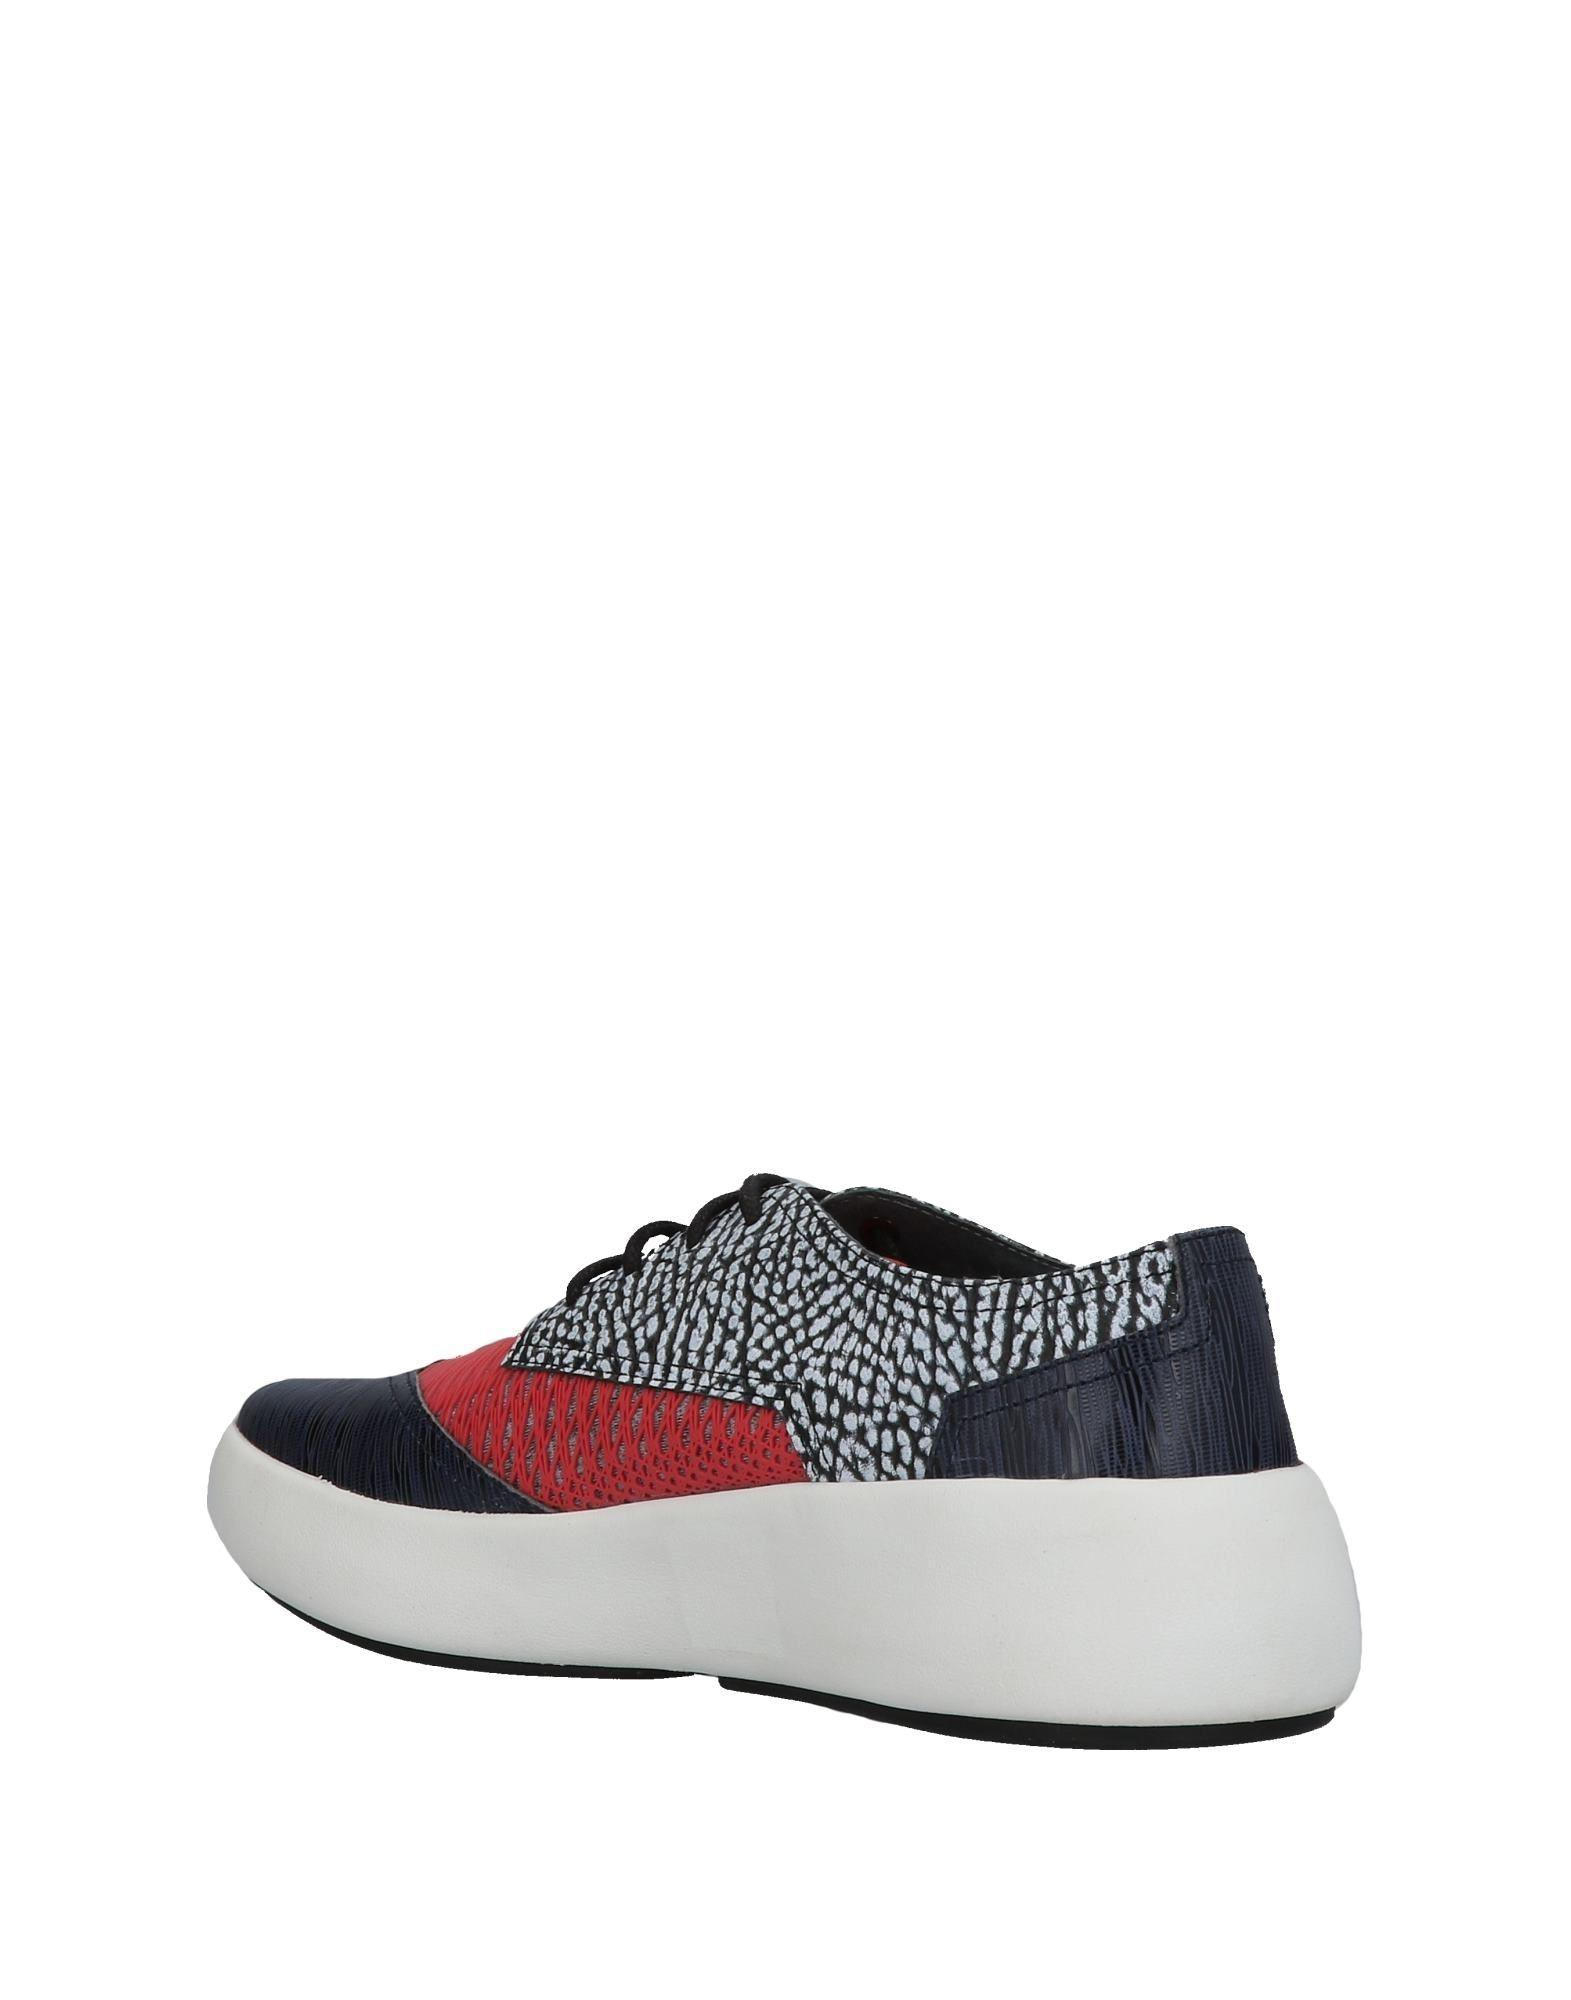 FOOTWEAR - Low-tops & sneakers United Nude XYQac